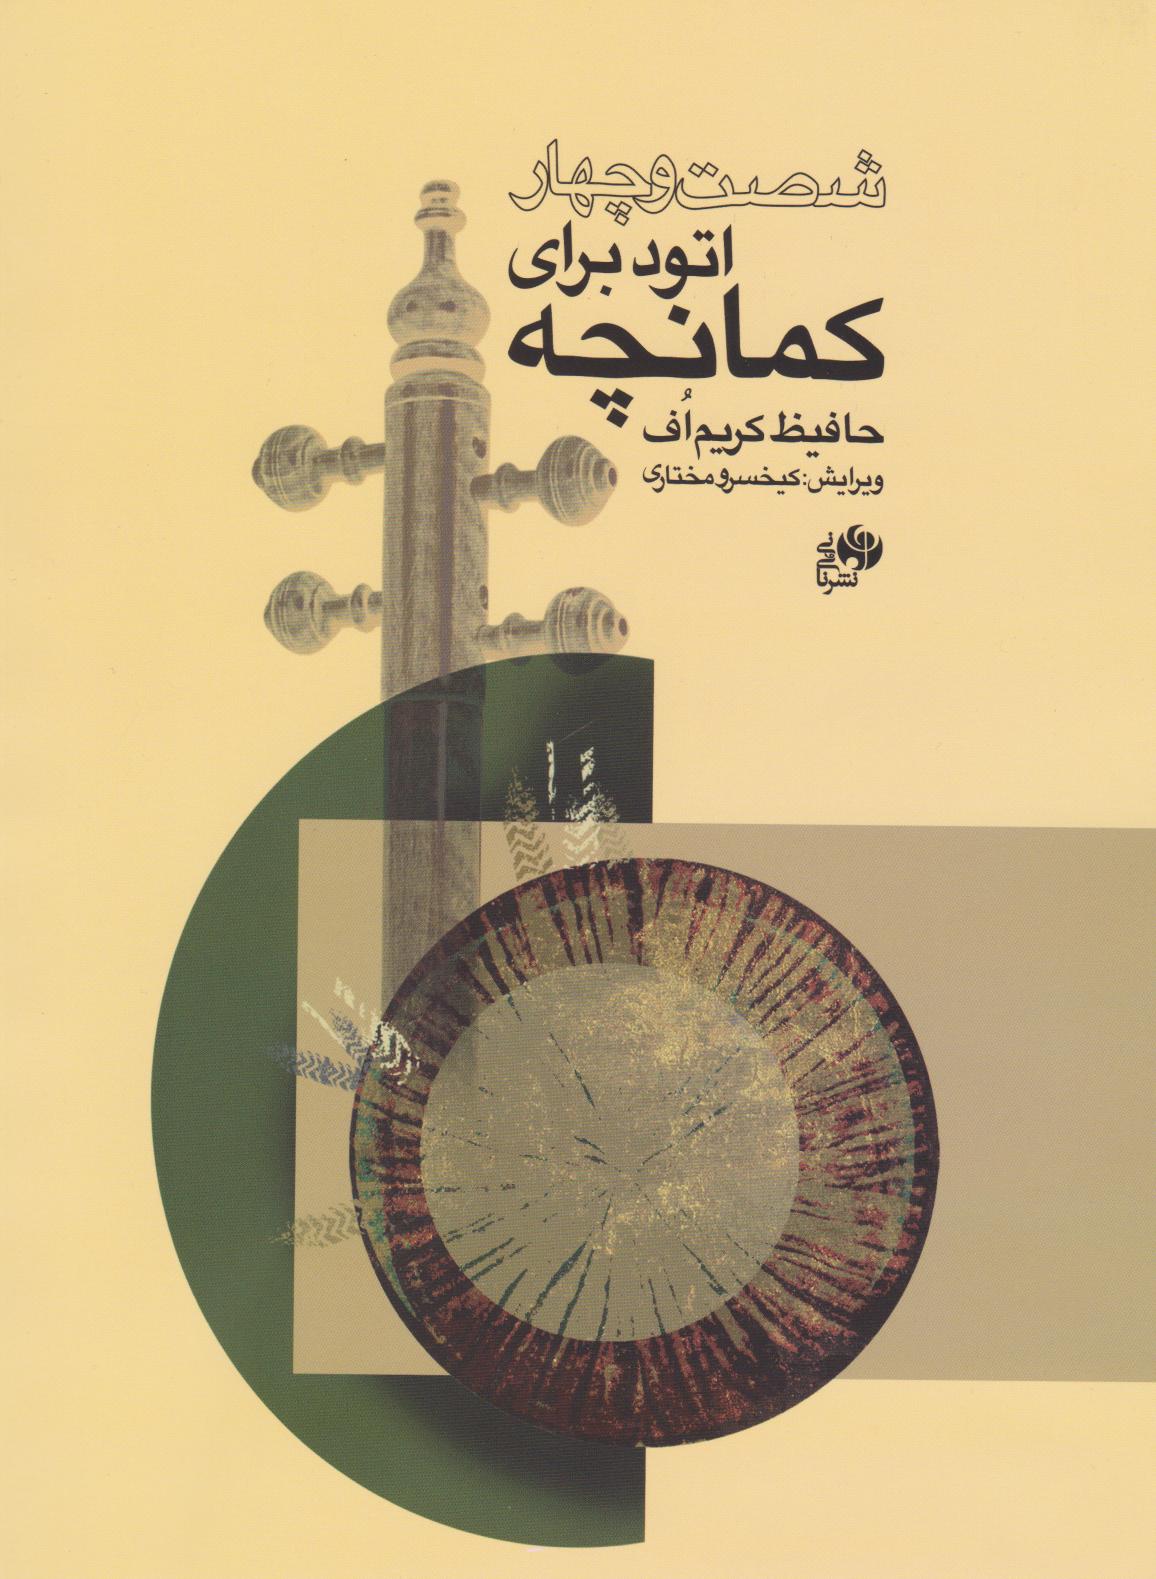 کتاب شصتوچهار اتود کمانچه حافیظ کریماف انتشارات نایونی